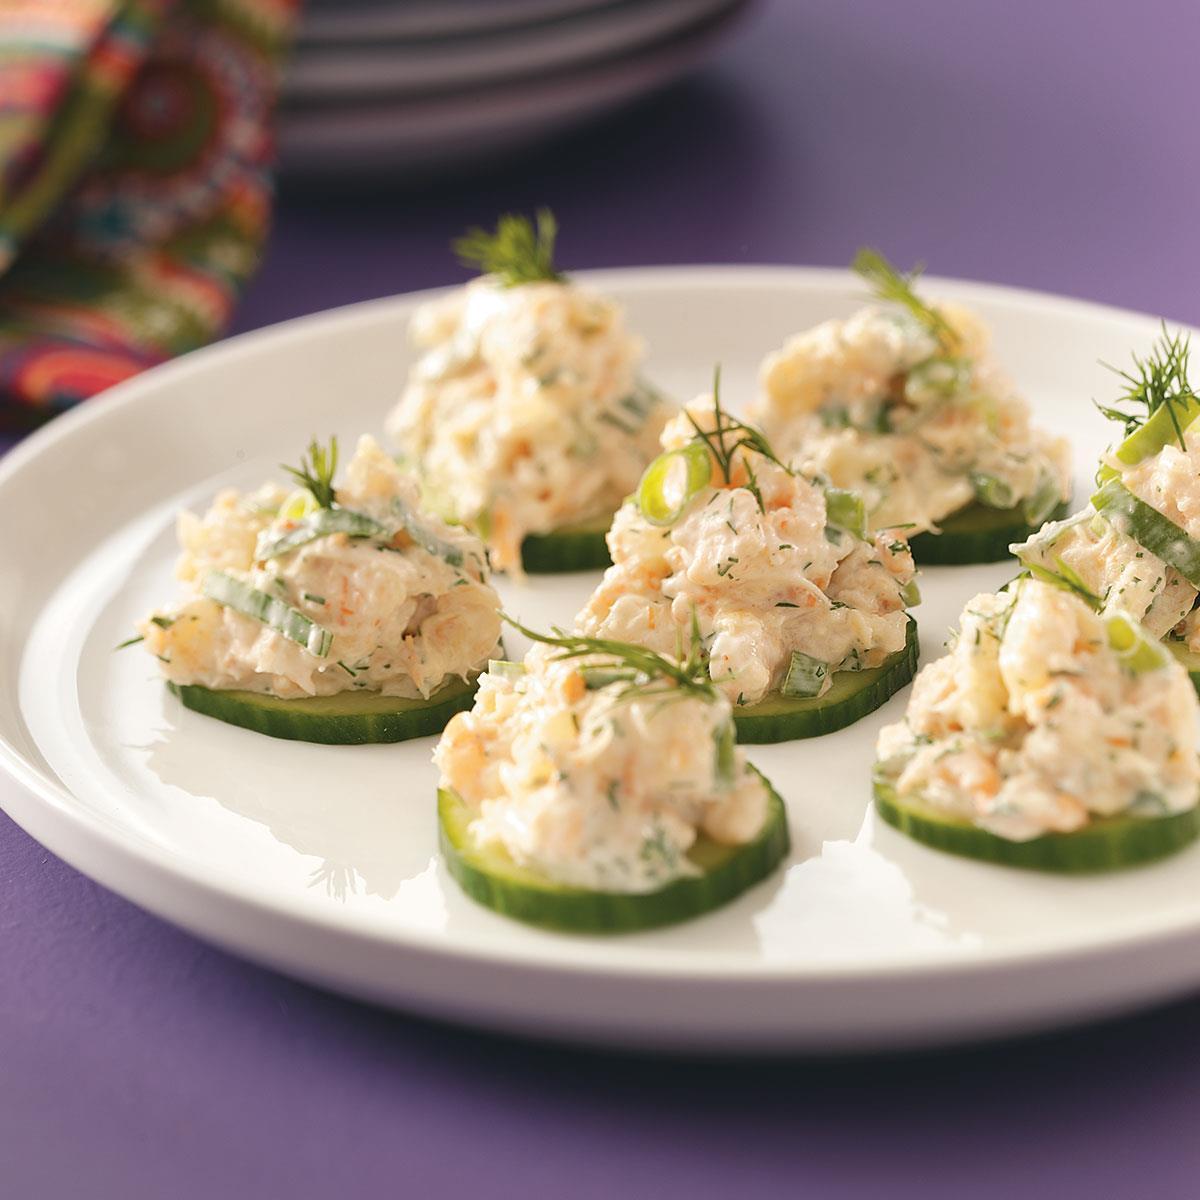 Shrimp Appetizer Recipes  Cucumber Shrimp Appetizers Recipe